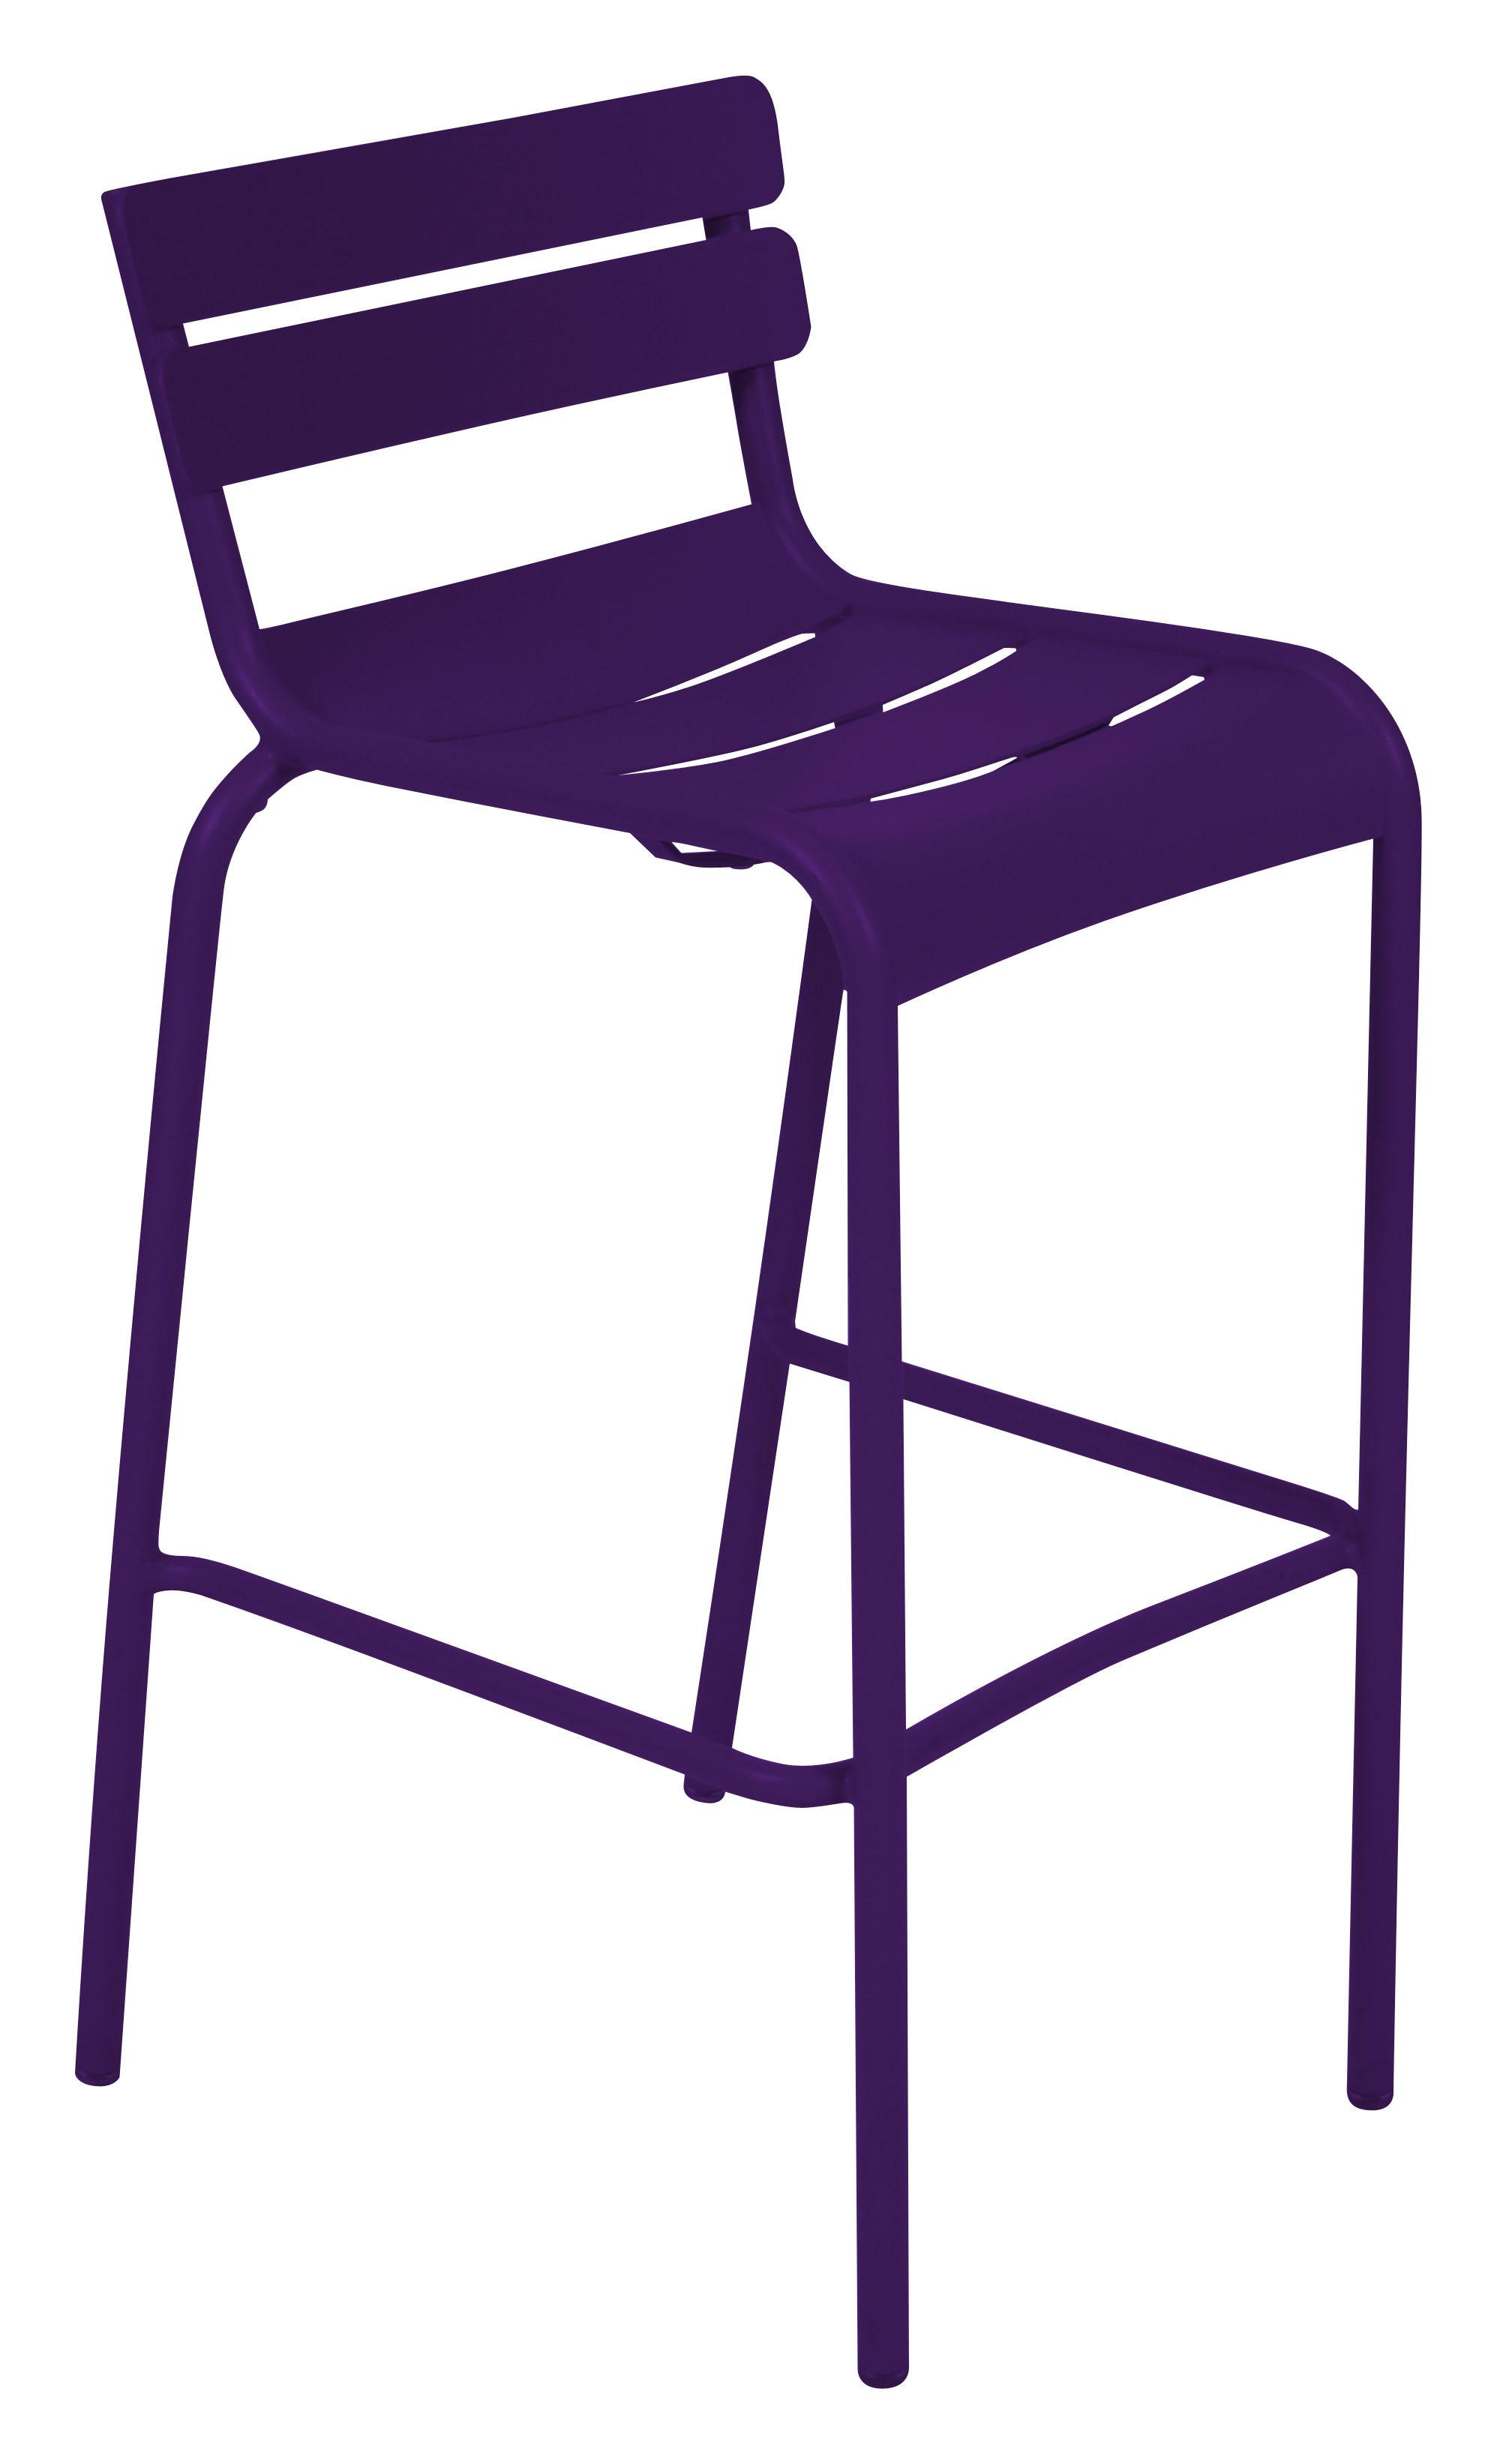 Life Style - Luxembourg Hochstuhl / Sitzhöhe 80 cm - Fermob - Aubergine - lackiertes Aluminium